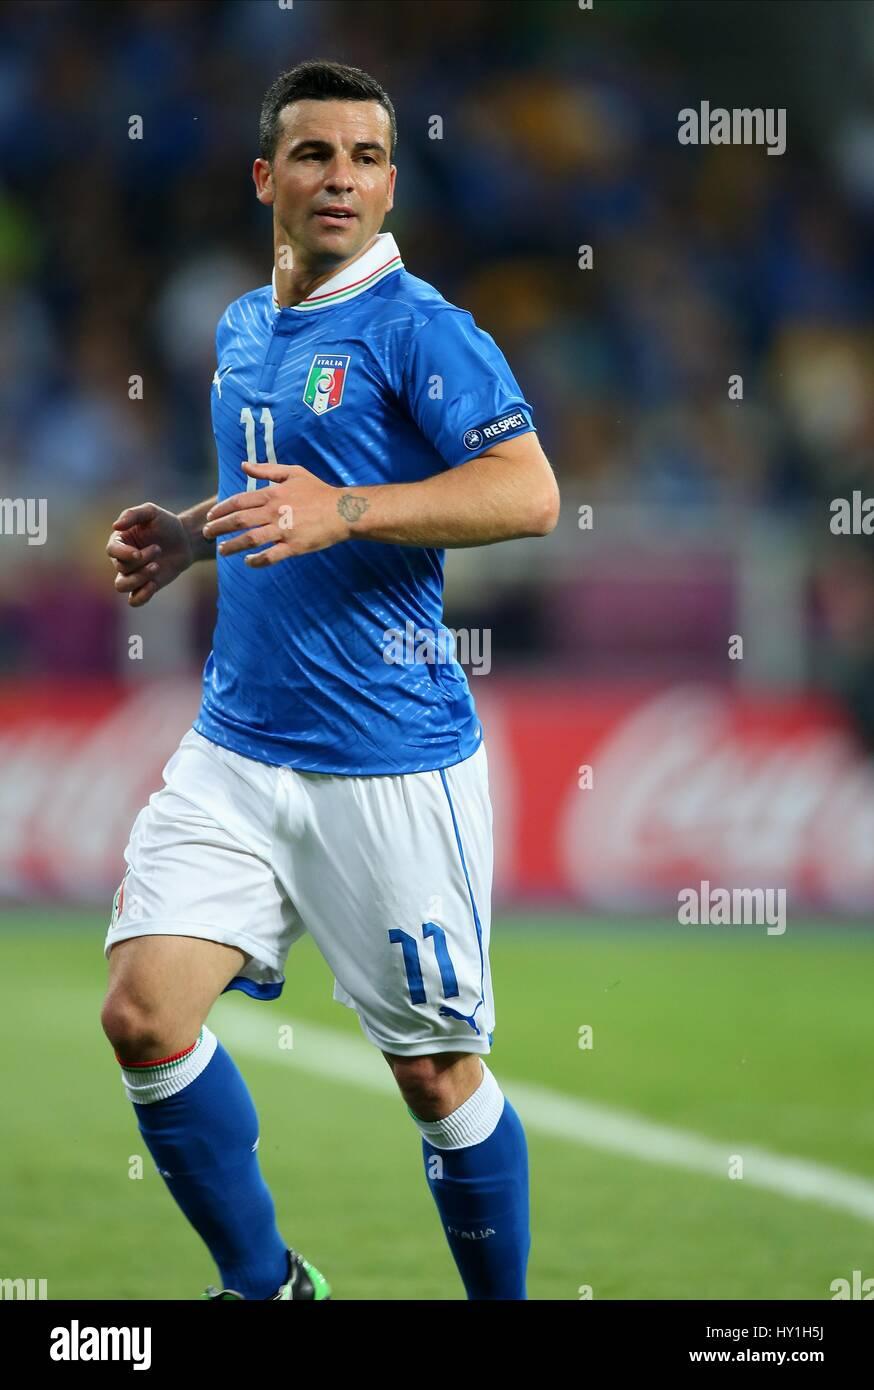 Antonio Di Natale.Antonio Di Natale Italy Udinese Italy Udinese Olympic Stadium Kiev Stock Photo Alamy